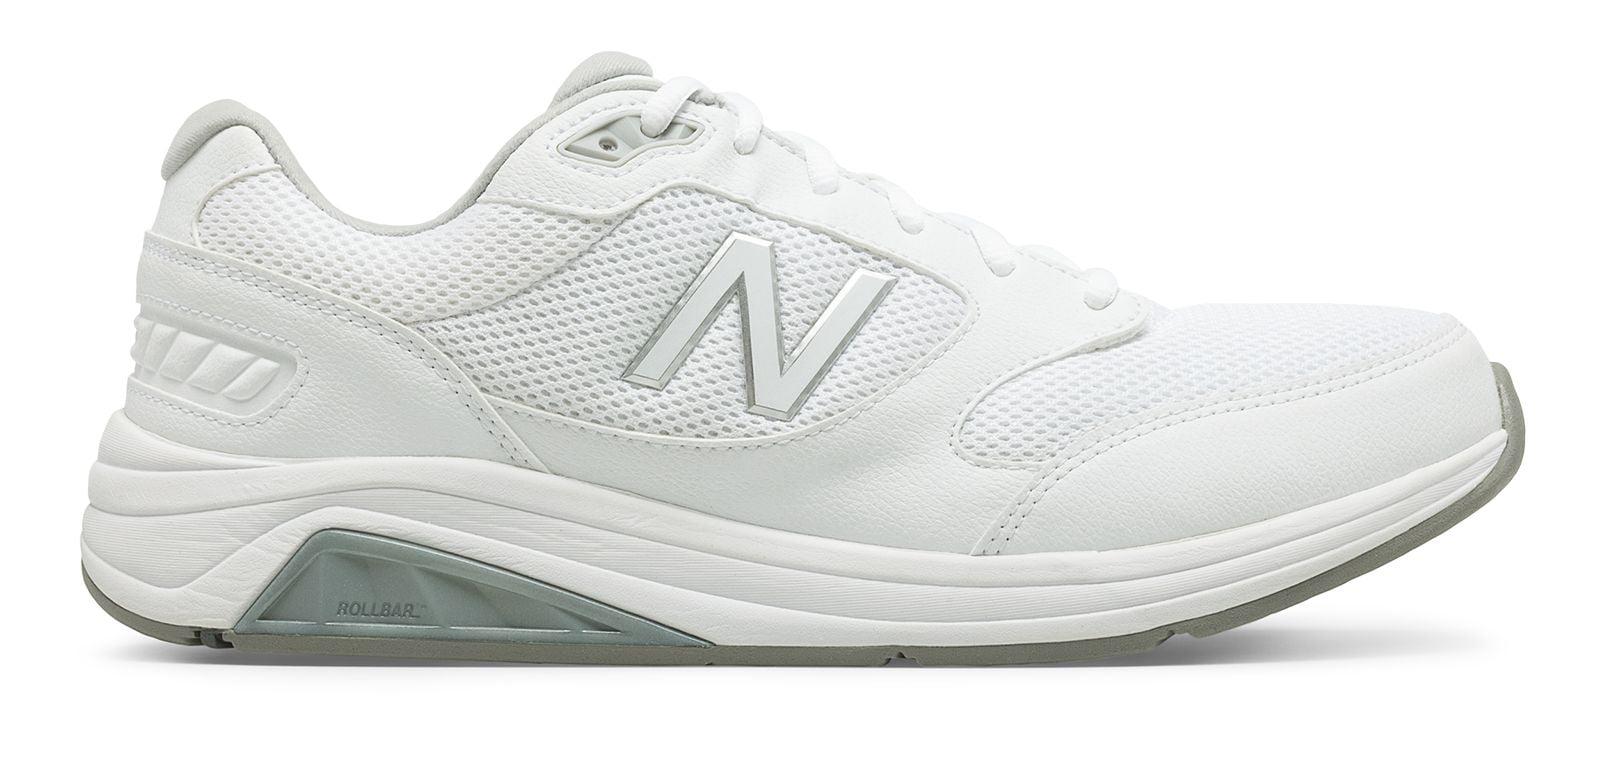 New Balance Men's 928v3 Walking Shoe by New Balance